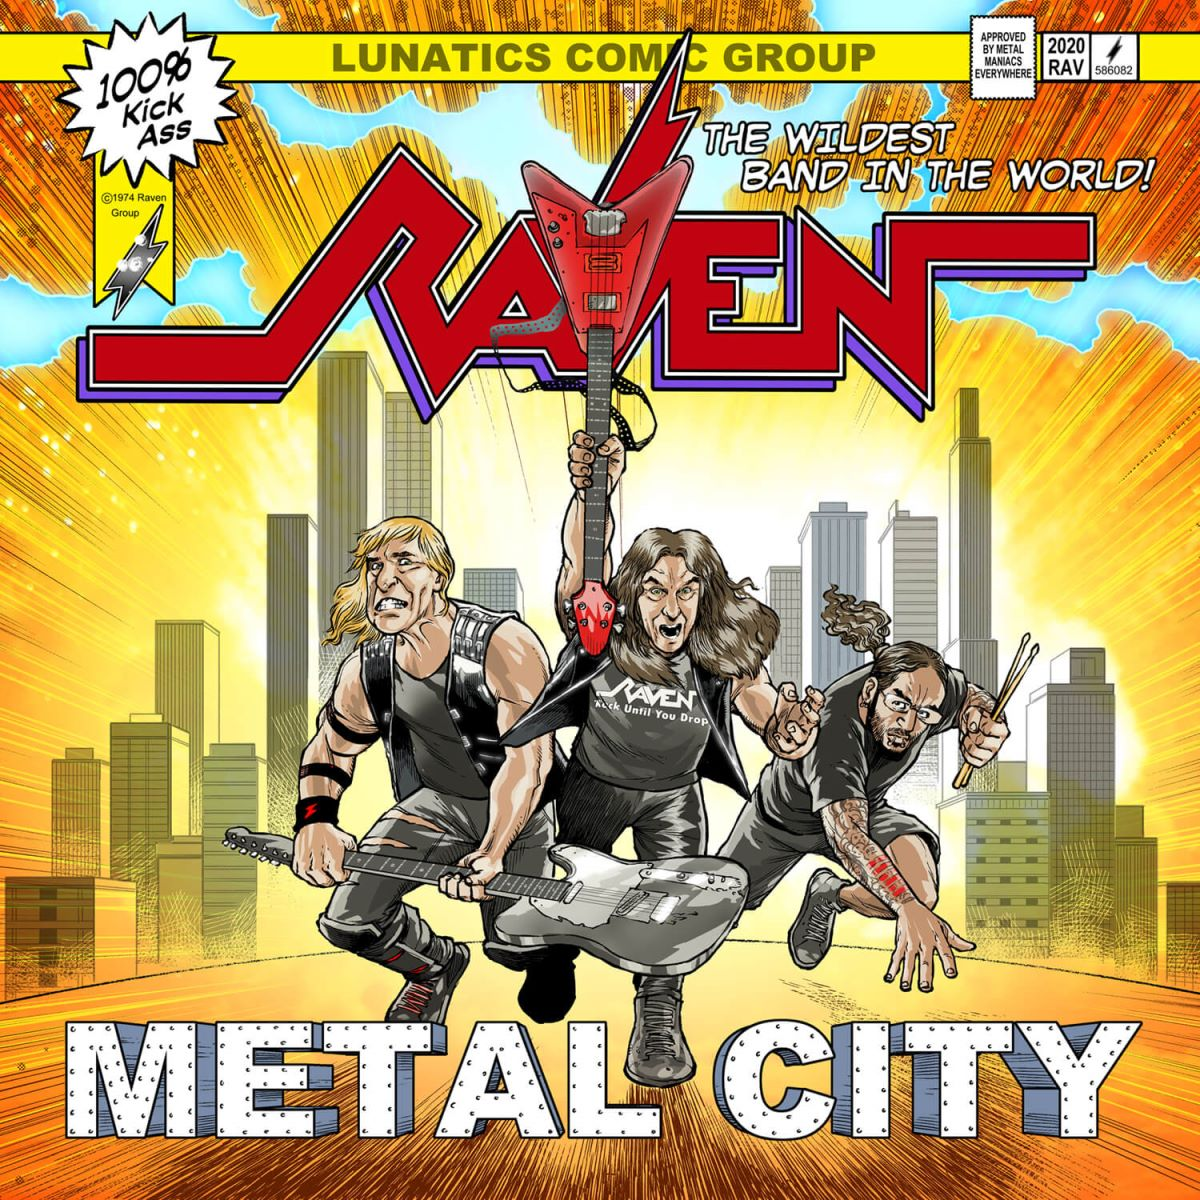 Raven - Metal City - album cover